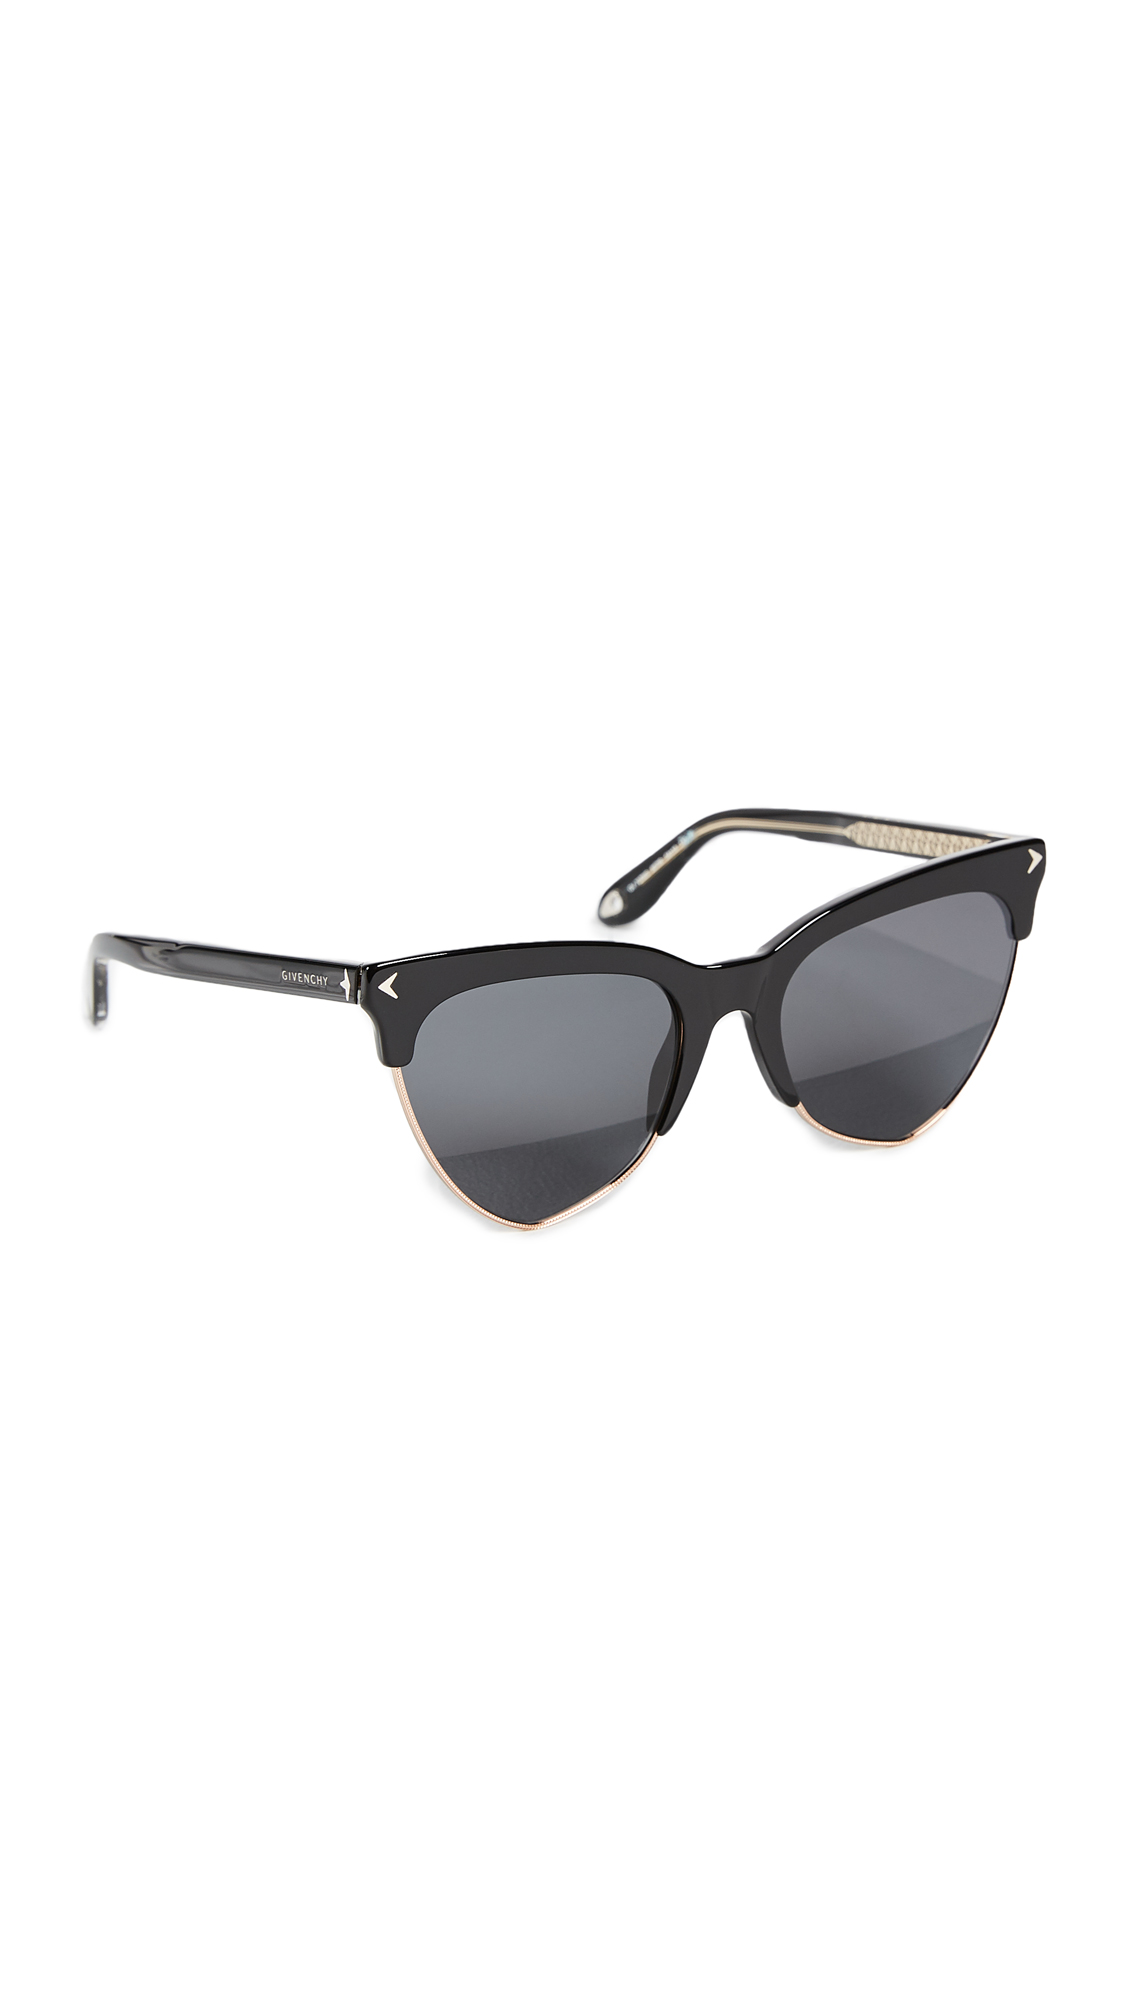 Givenchy Teardrop Sunglasses - Black Gold/Grey Blue